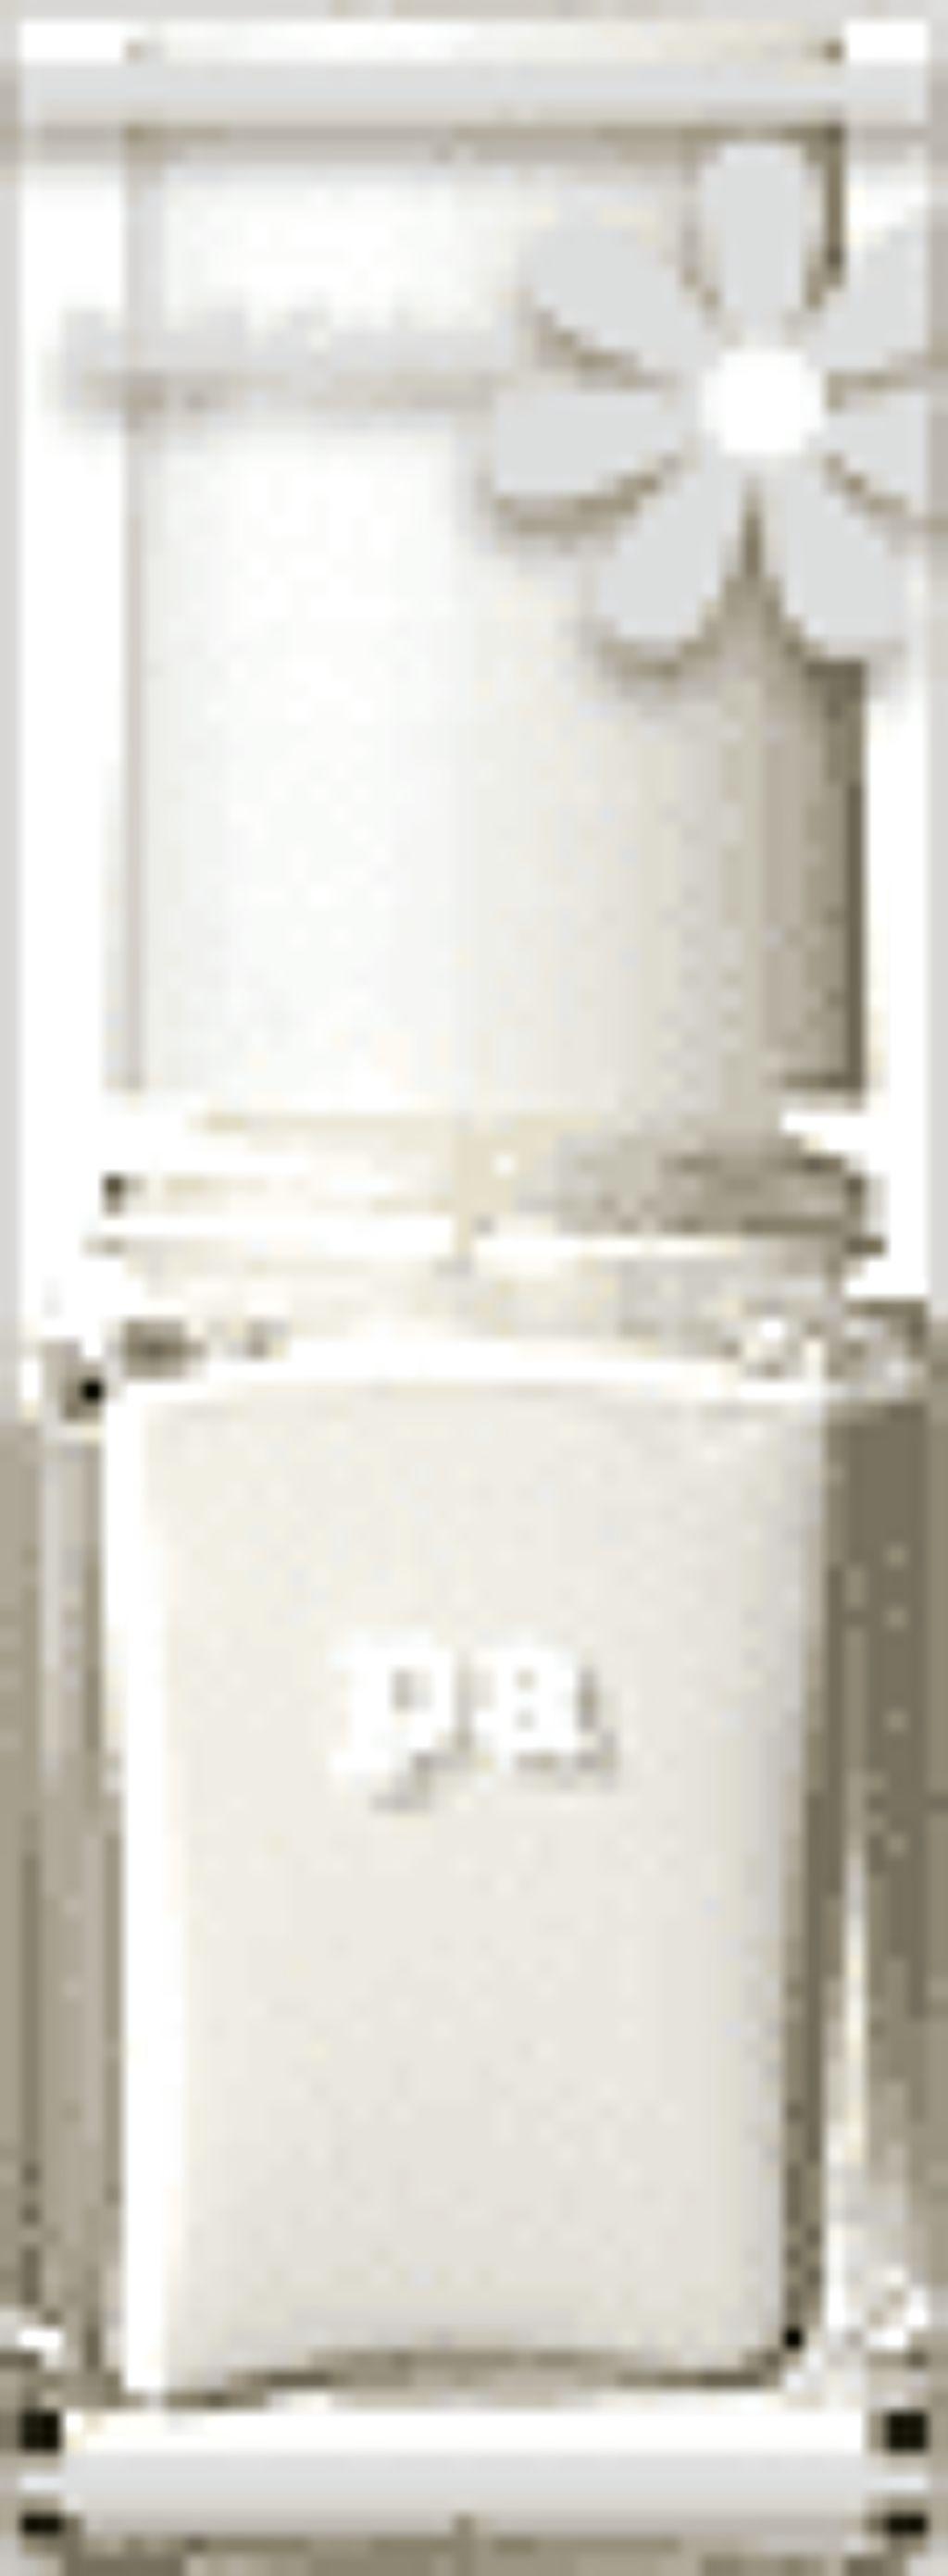 pa ネイルカラー(旧) A36